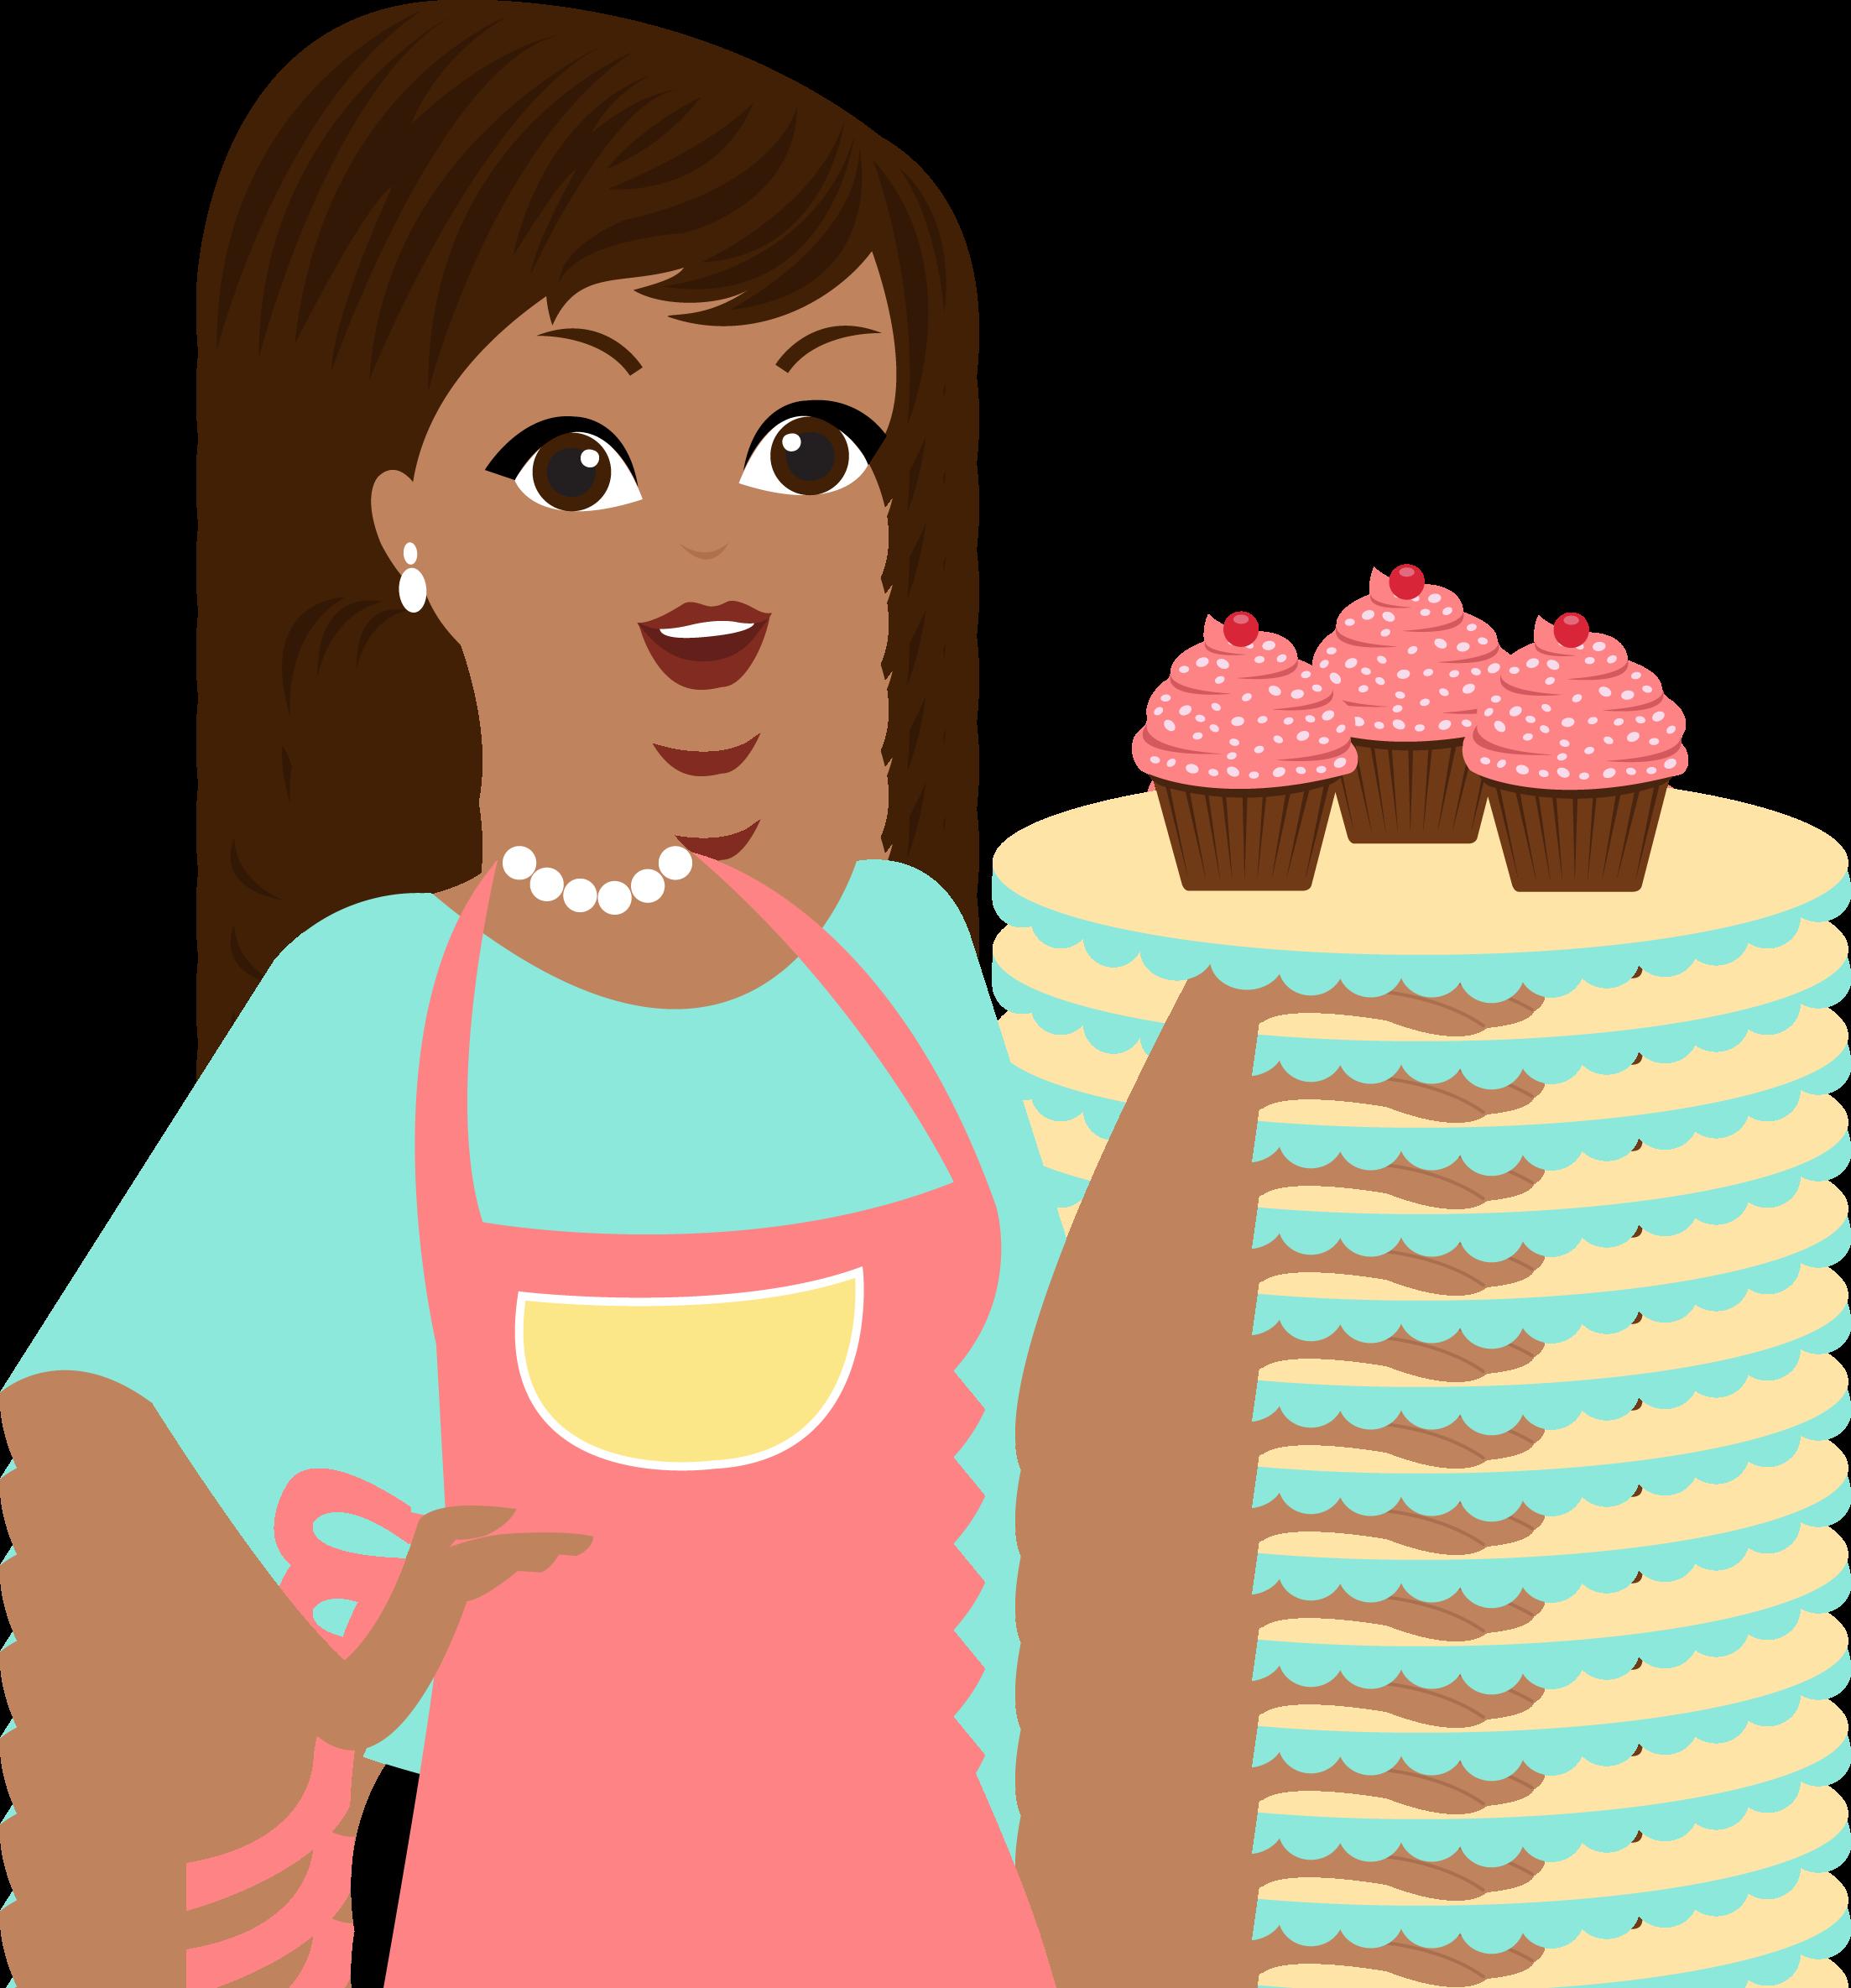 Kitchen chefs clipart clipartfest cartoon restaurant kitchen - Explore Baking Party Cupcake Art And More